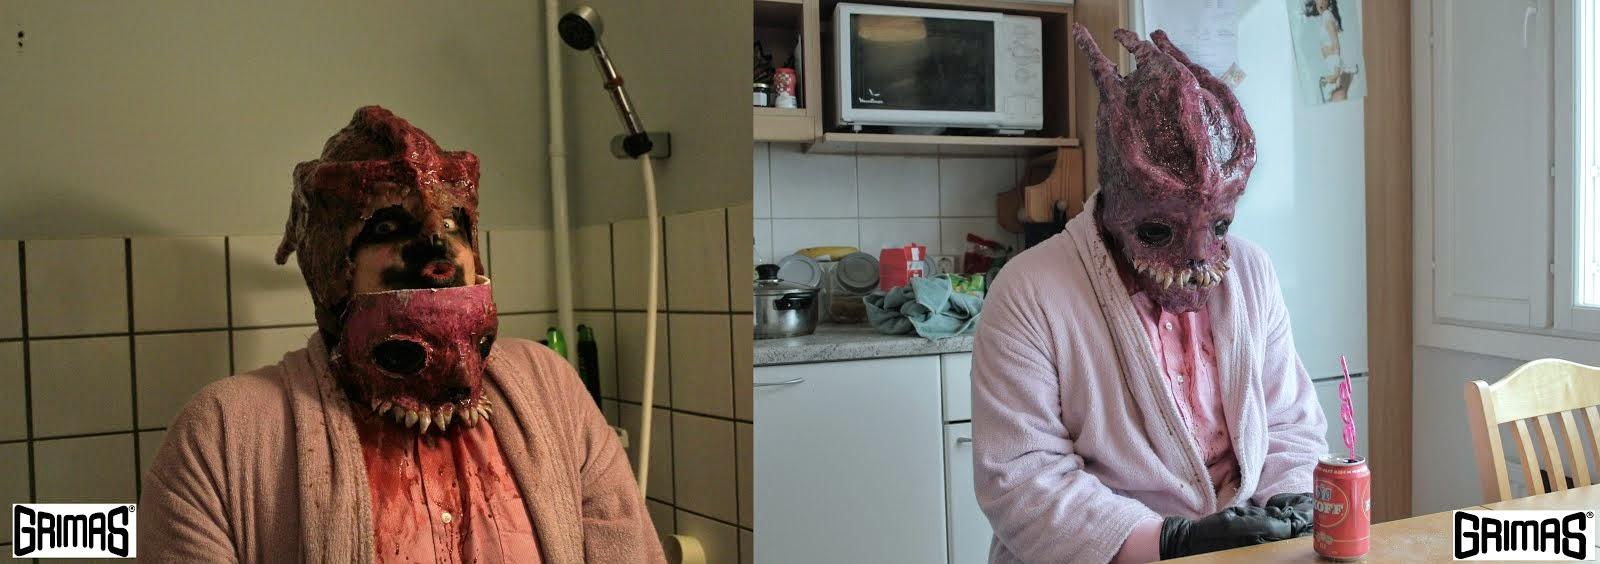 Creature / alien makeup test. Efekti- ja tehostemaskeeraus: Ari Savonen.